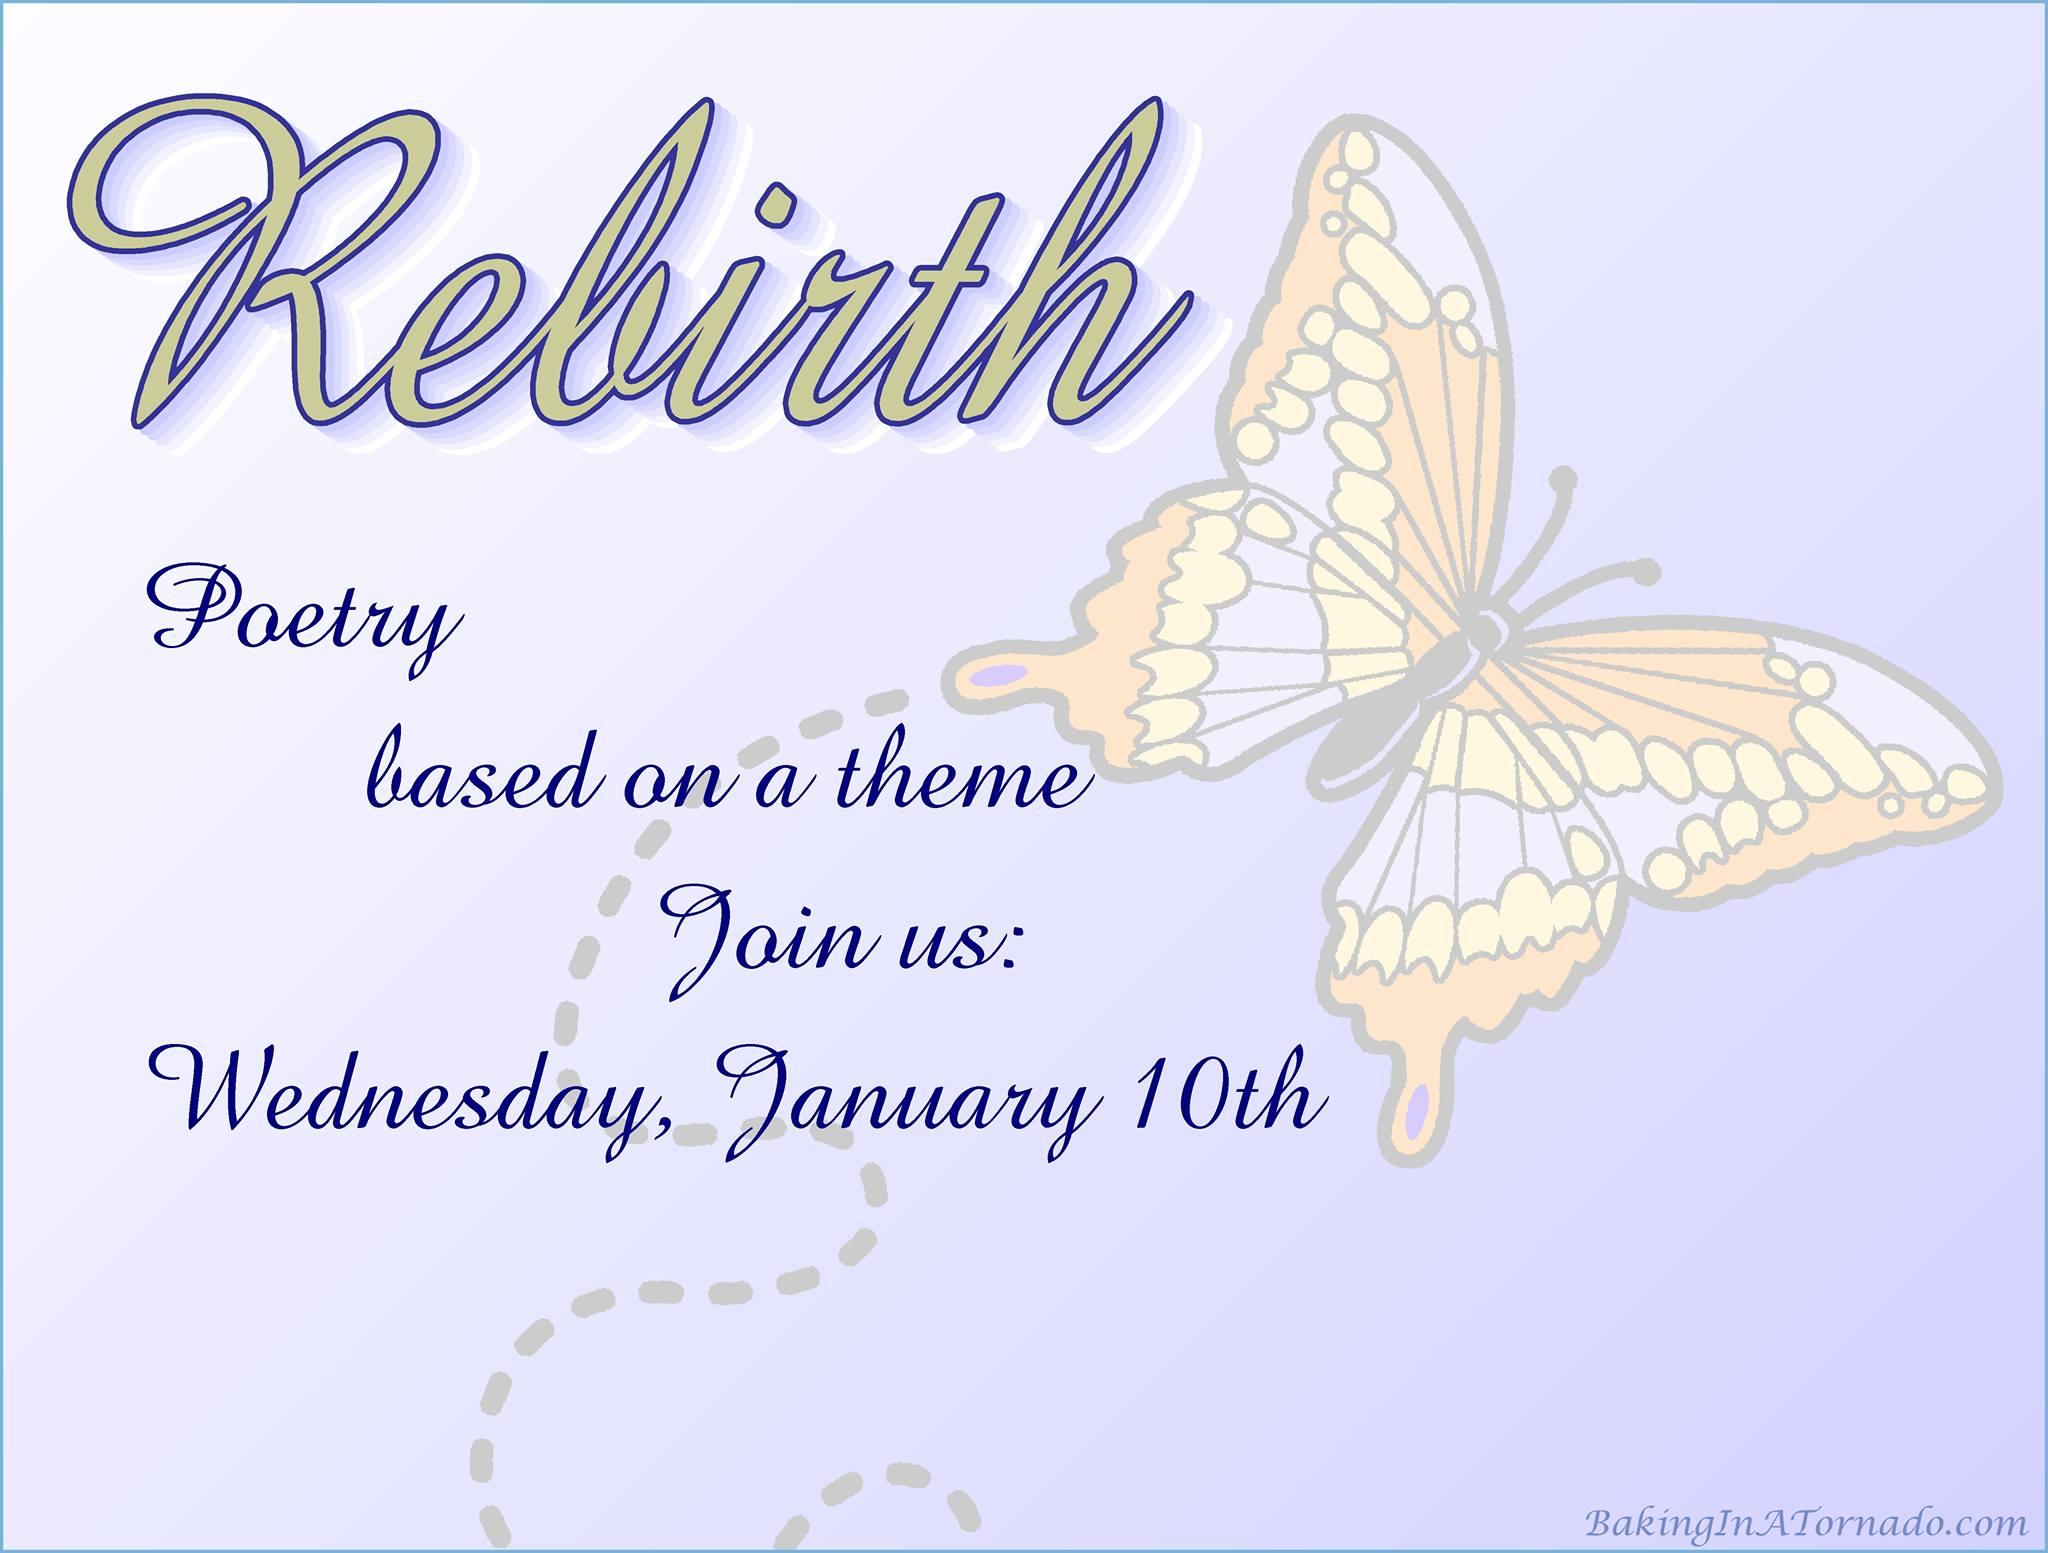 rebirth poem